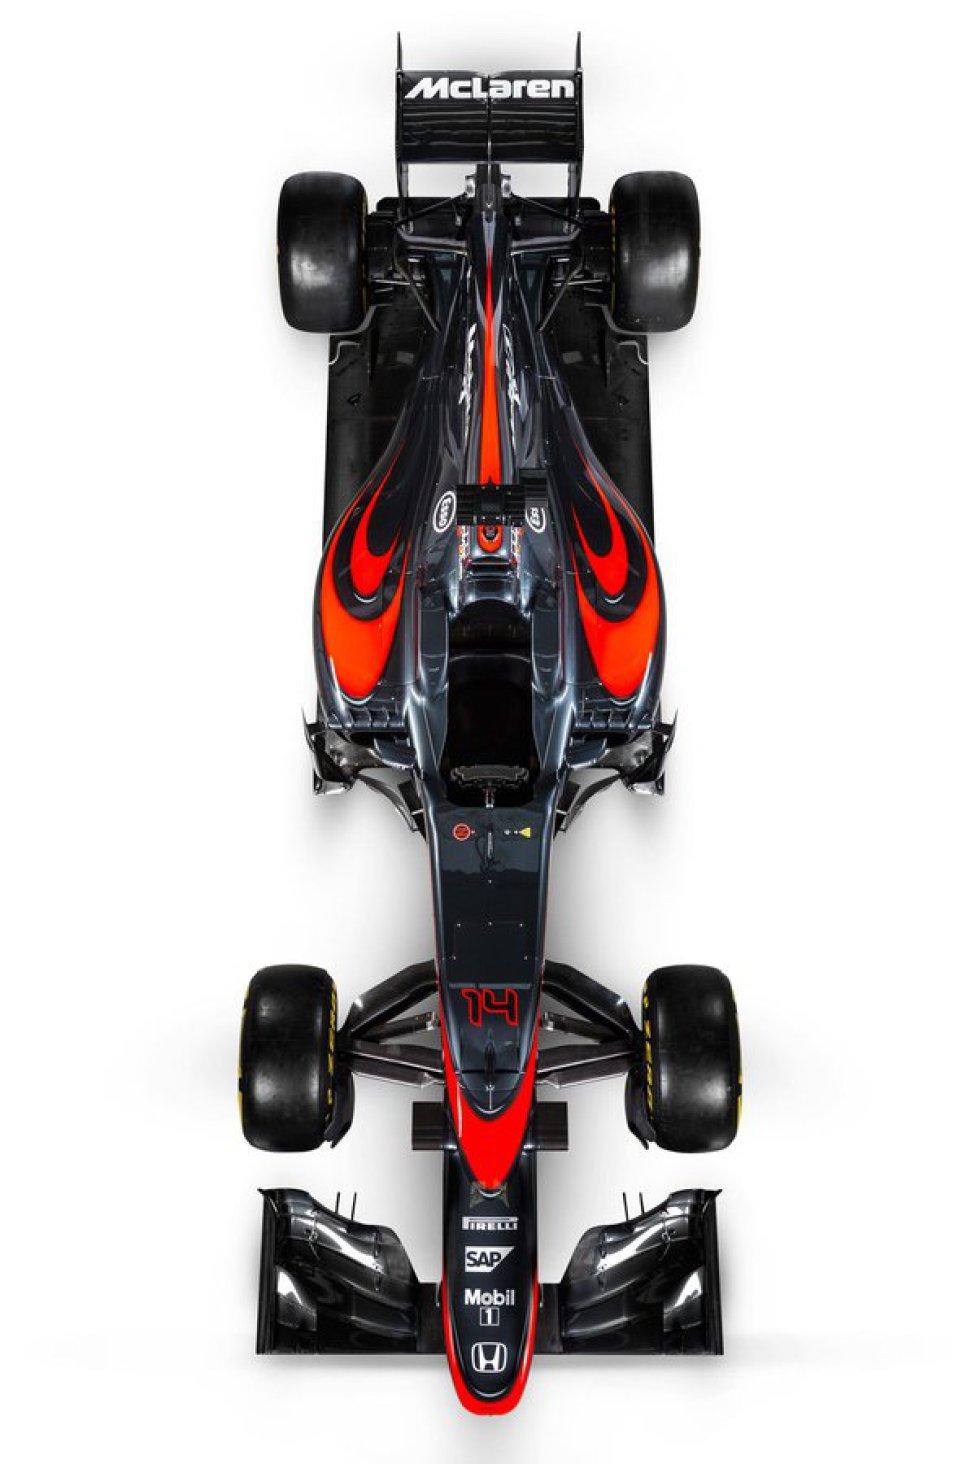 Formula 1 - 2015 - Página 2 1430911075_069513_1430911597_album_grande